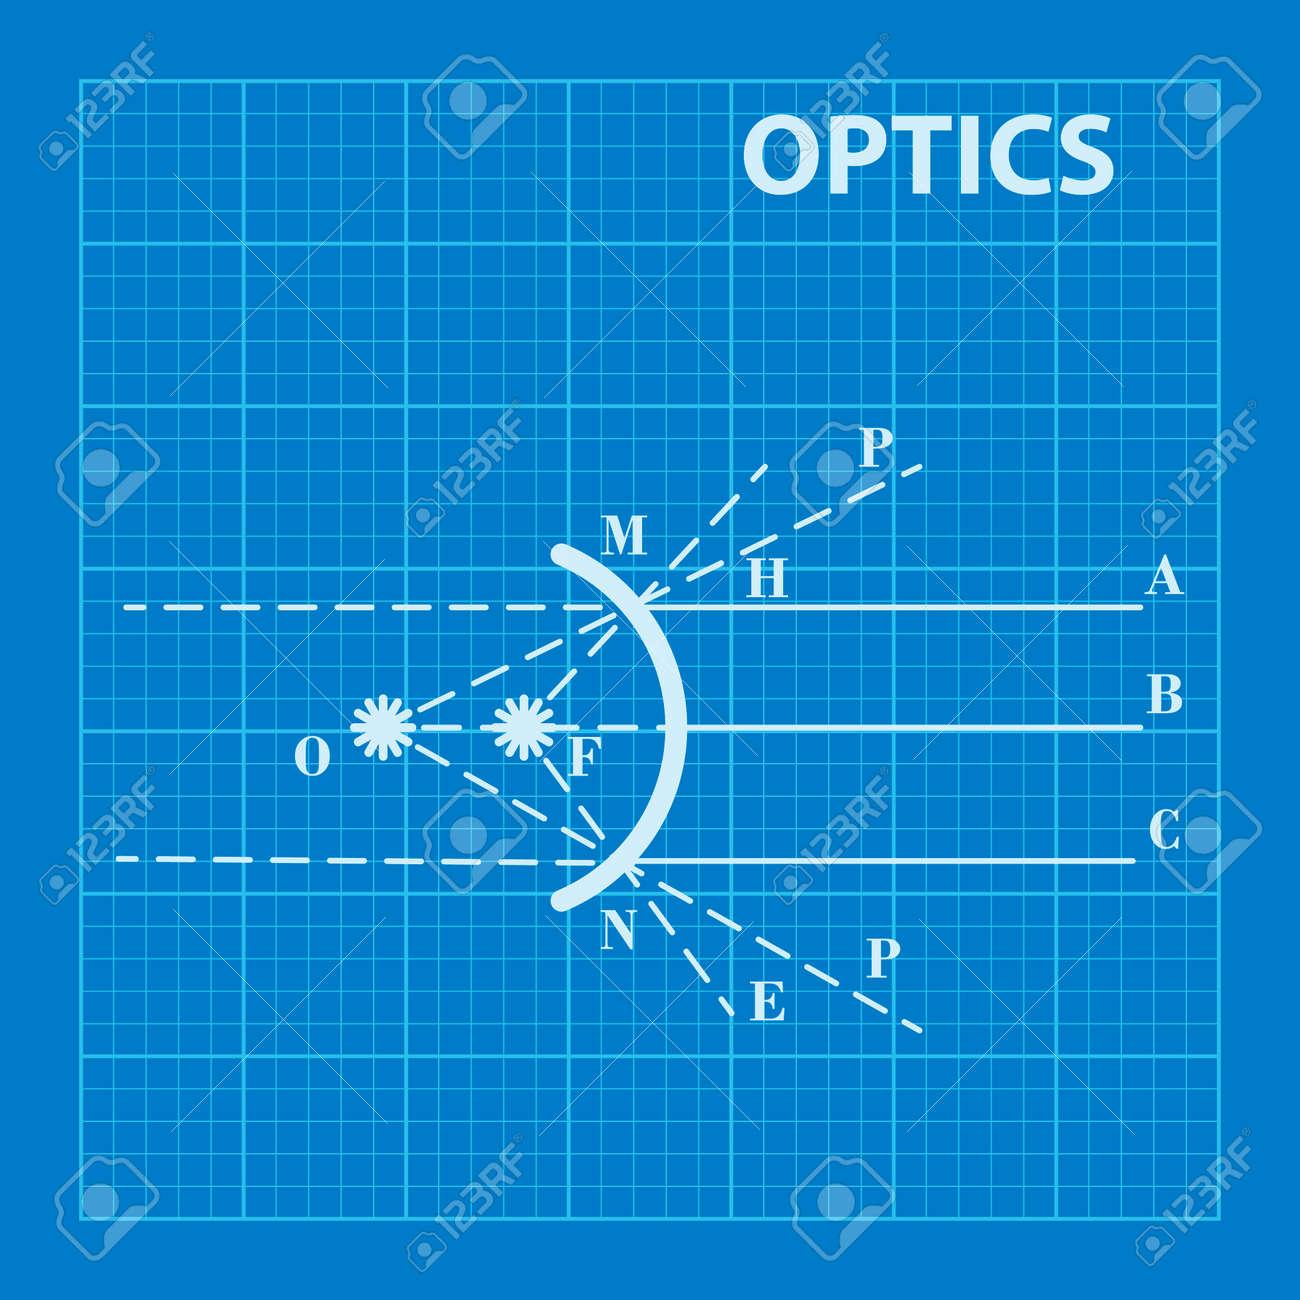 Infographic physics geometrical optics on blueprint background geometrical optics on blueprint background vector illustration stock vector 44024182 malvernweather Choice Image